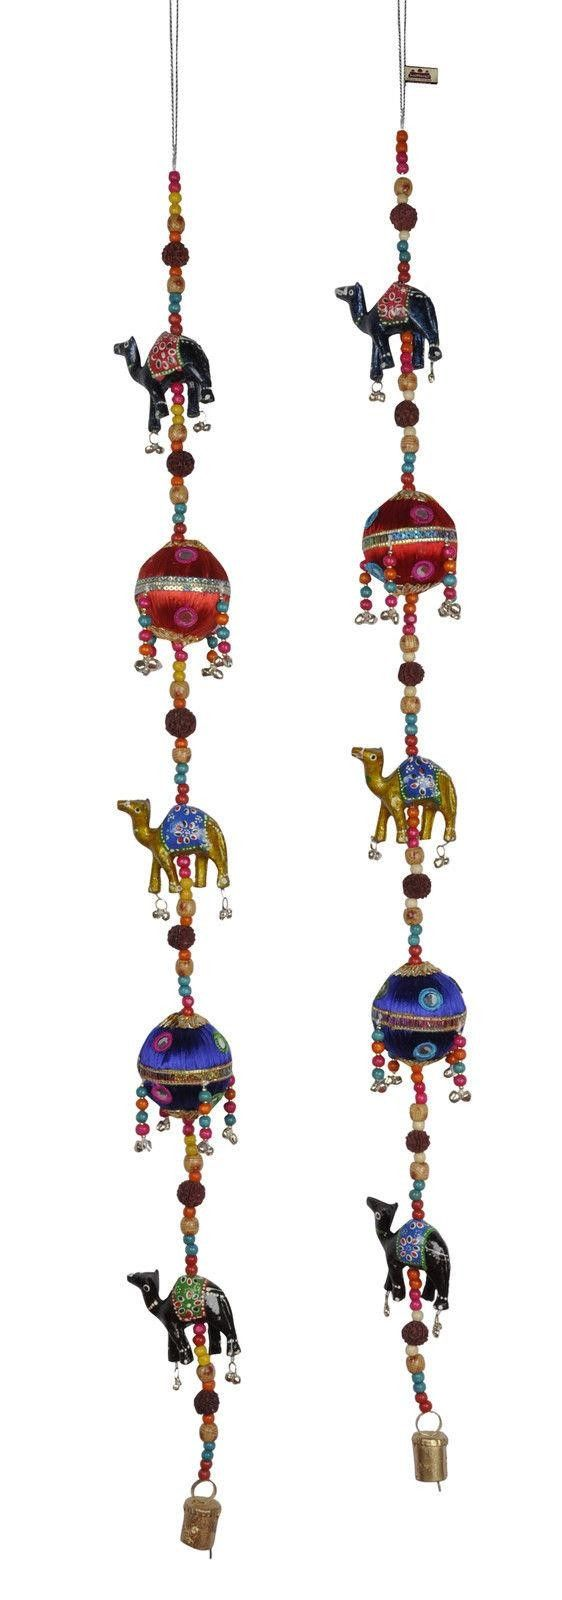 Metal Camel Ornaments Traditional Door Hanging Wall String Bells